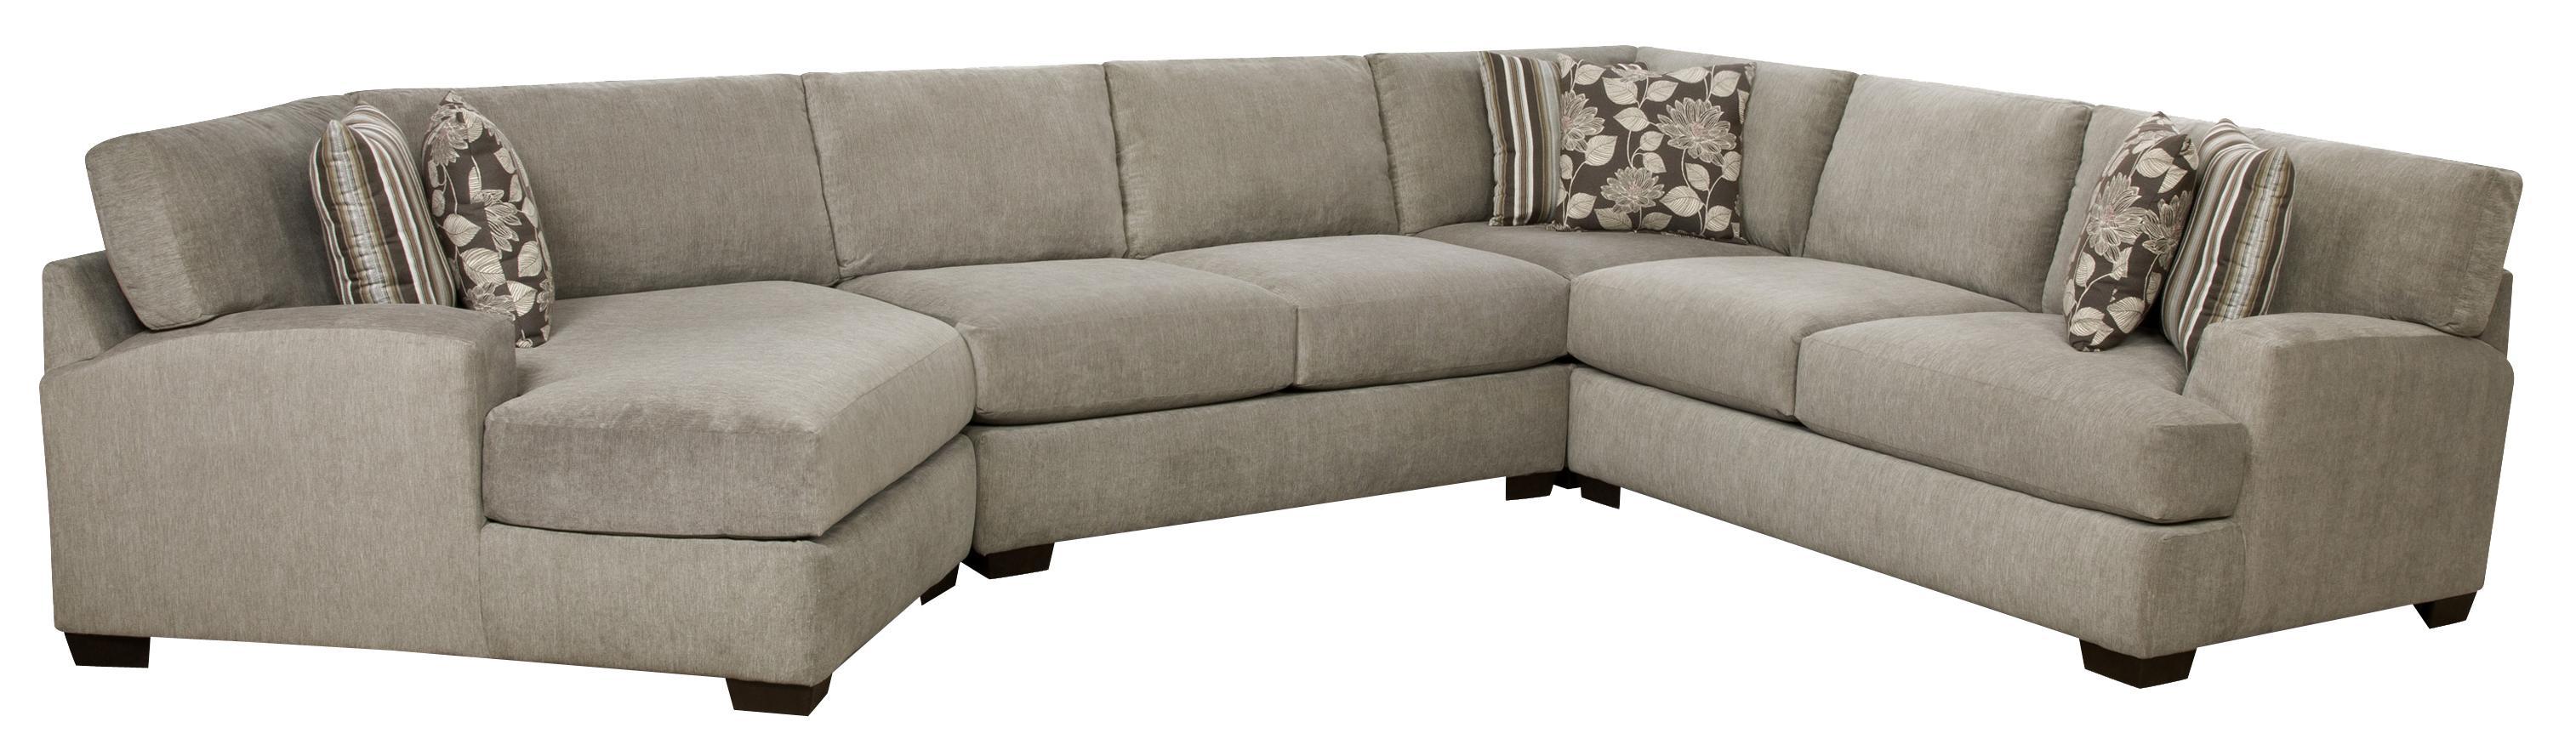 corinthian sofas sofa bed storage reviews